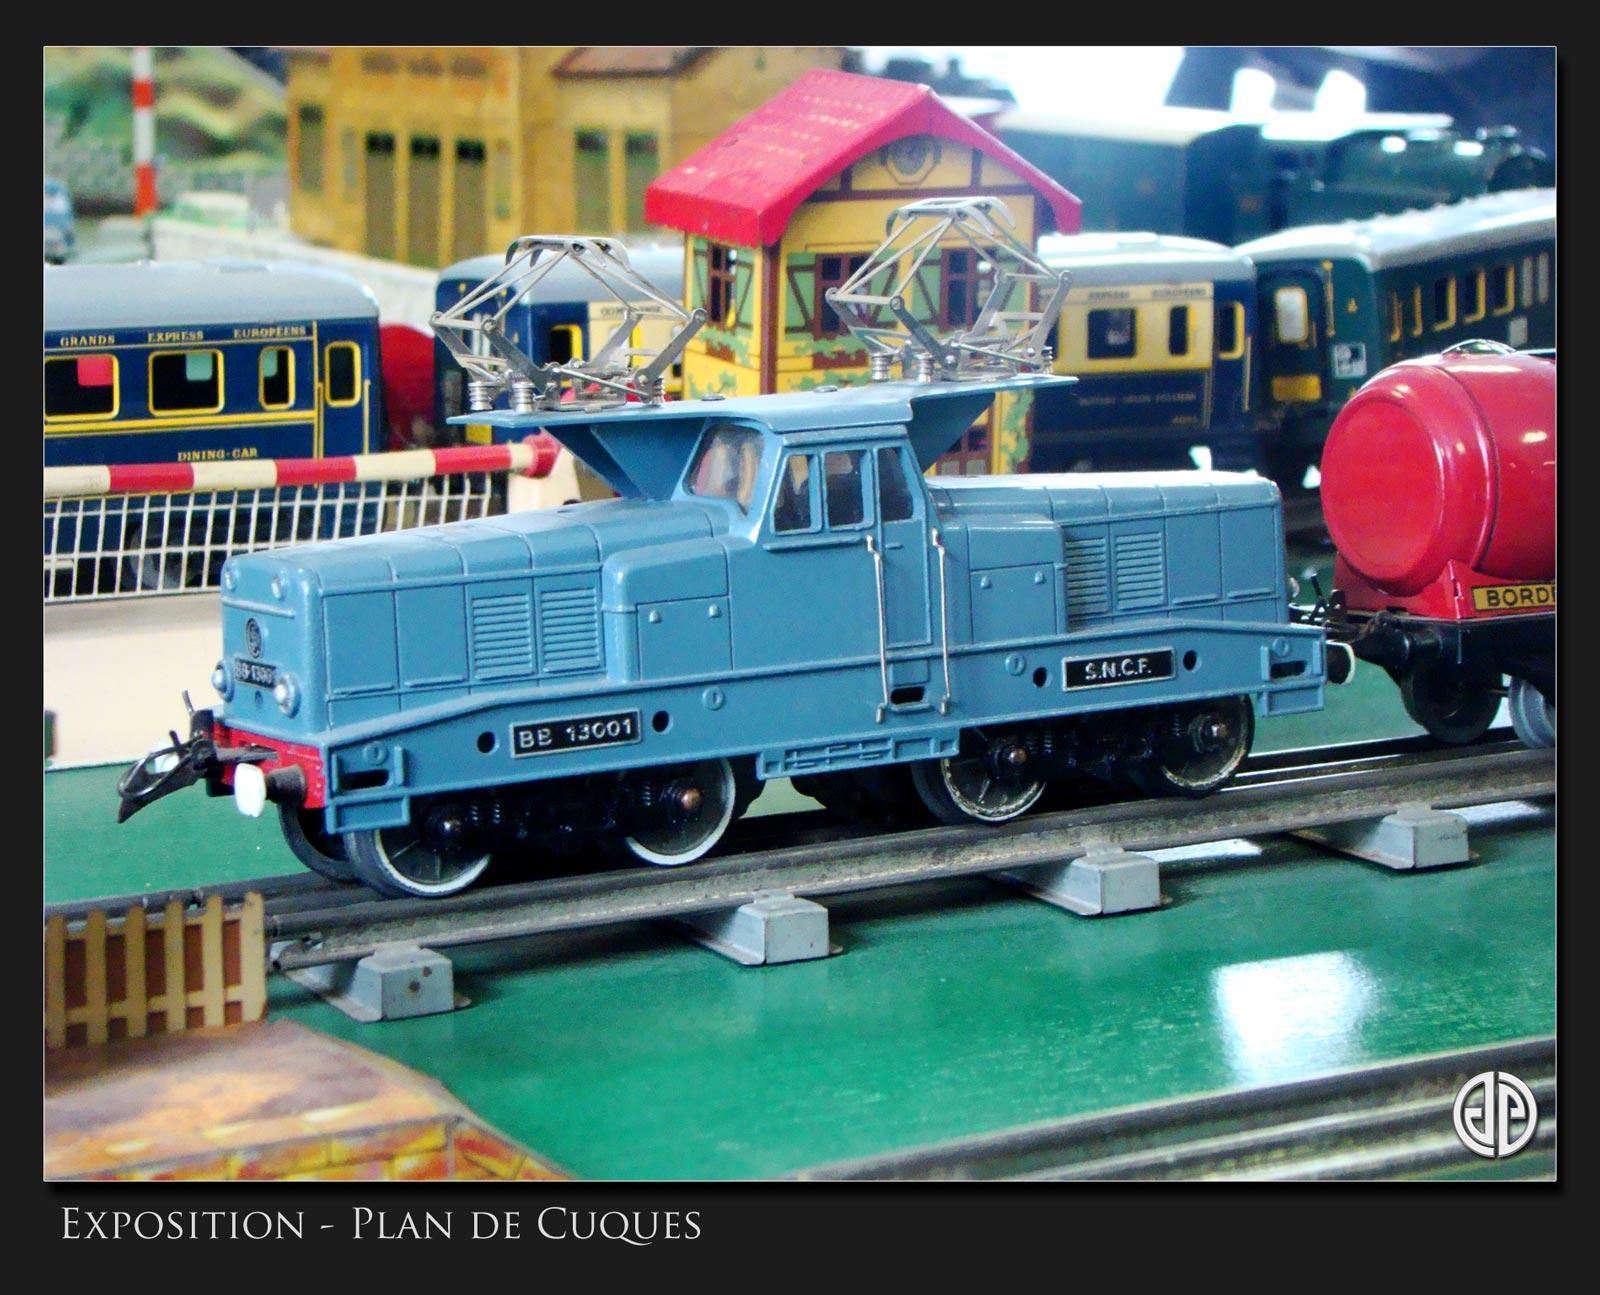 Expo-ferroviaire-Plan-de-Cuques-02